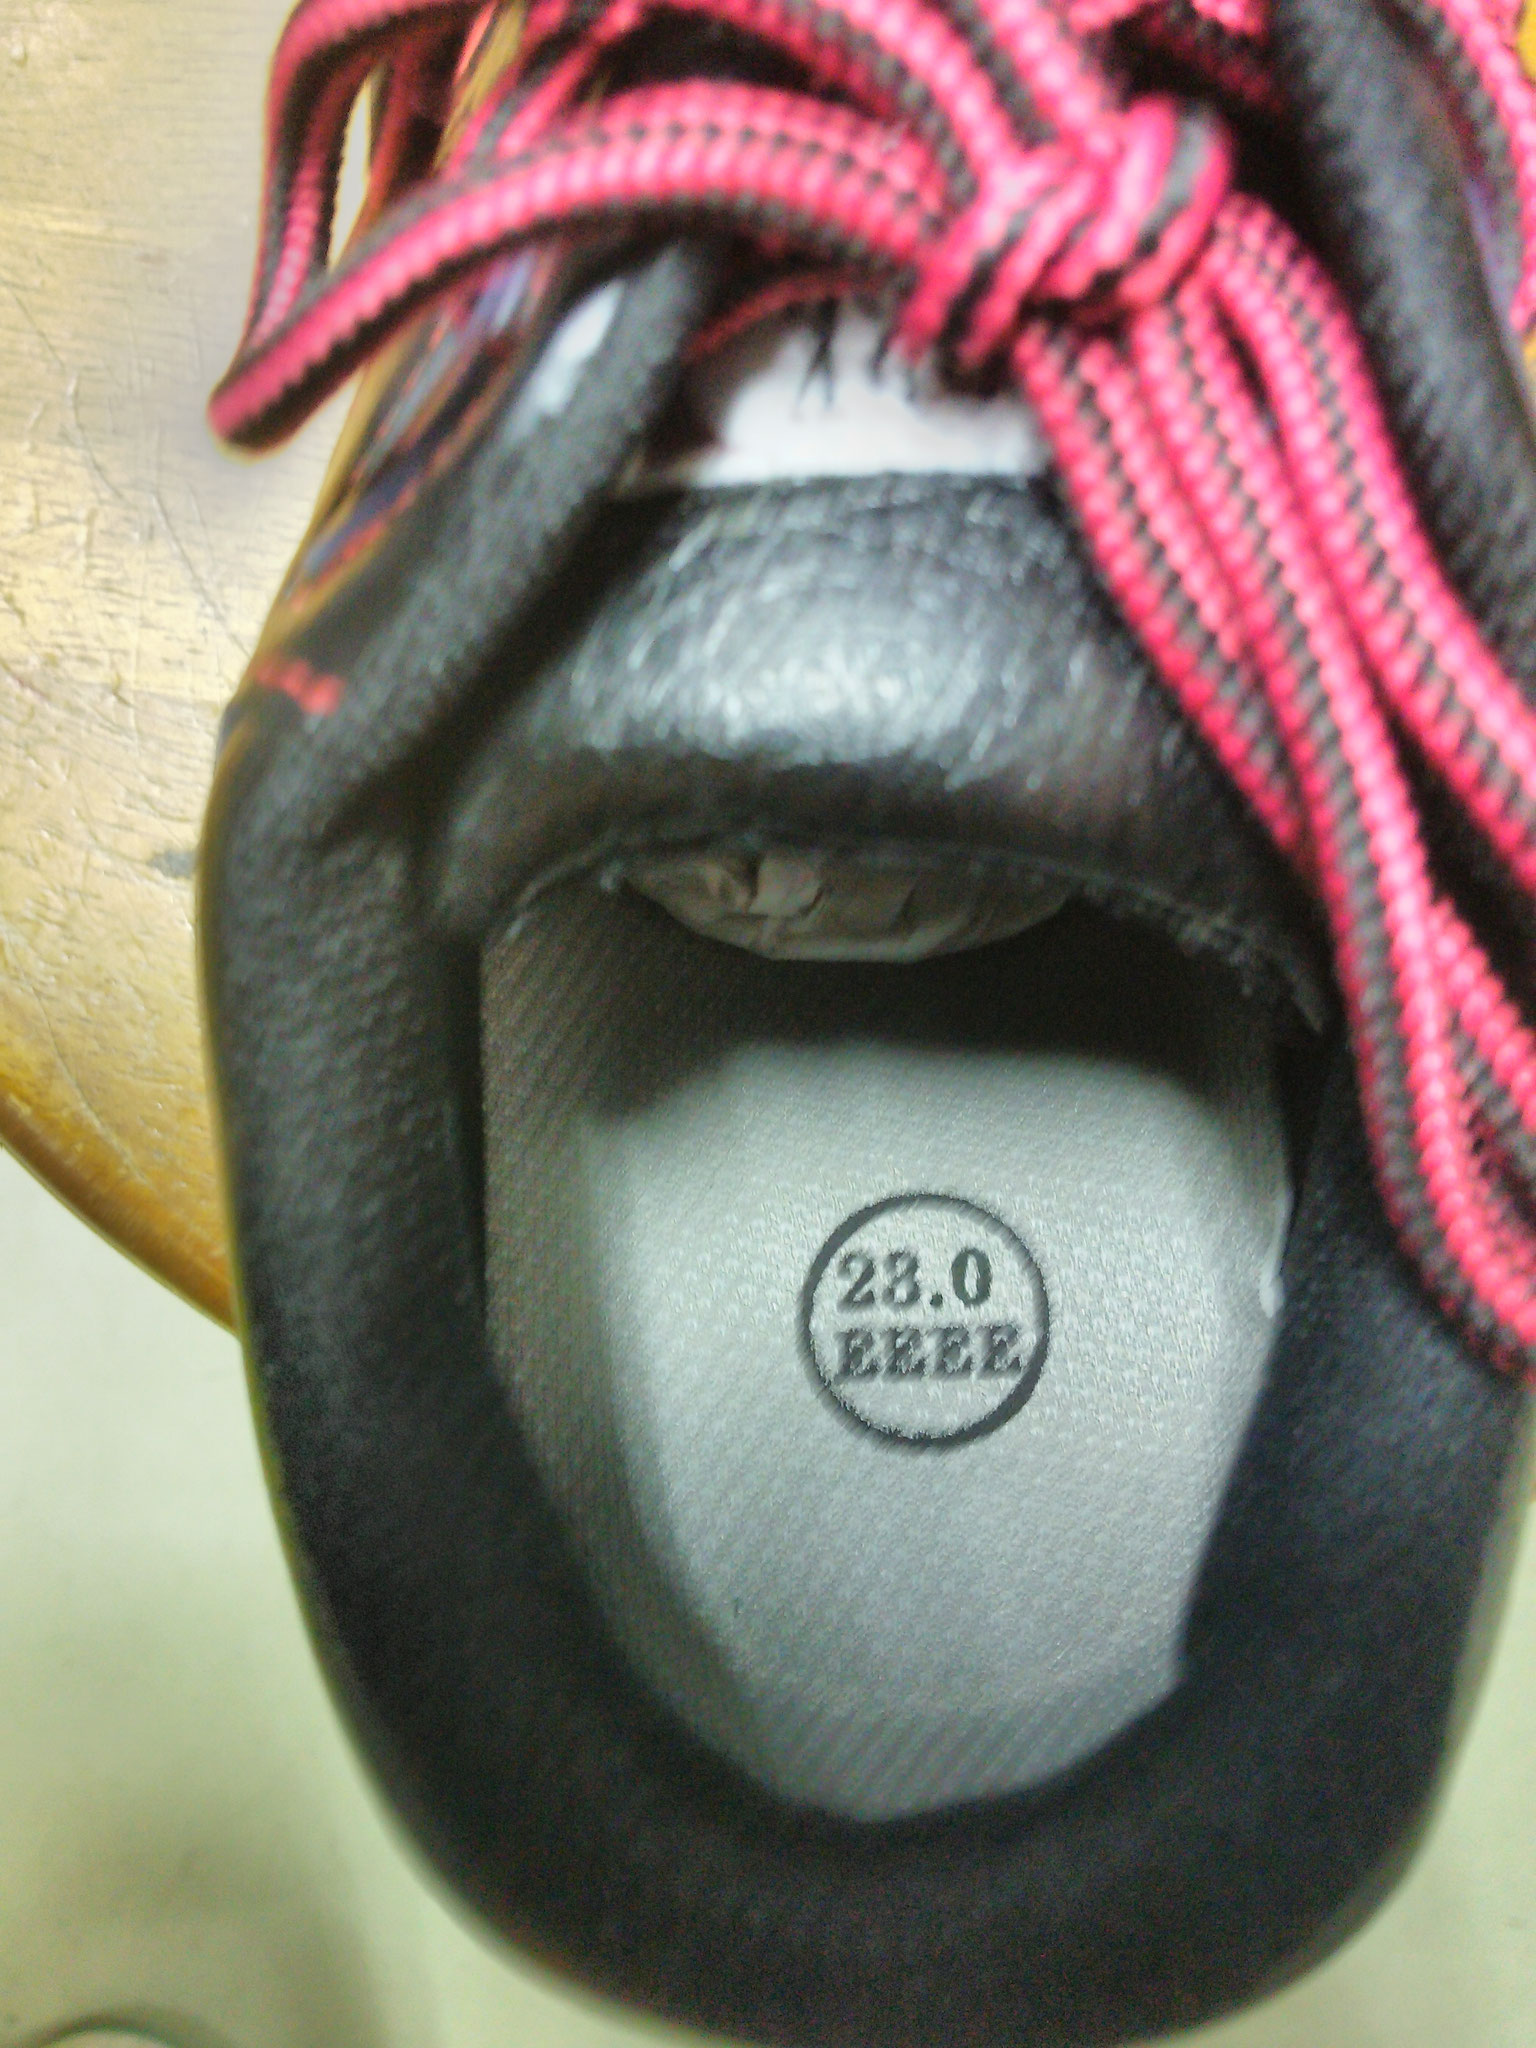 JW-750  安全靴 ¥3,300(税込) 甲高幅広の方も安心の4E!!